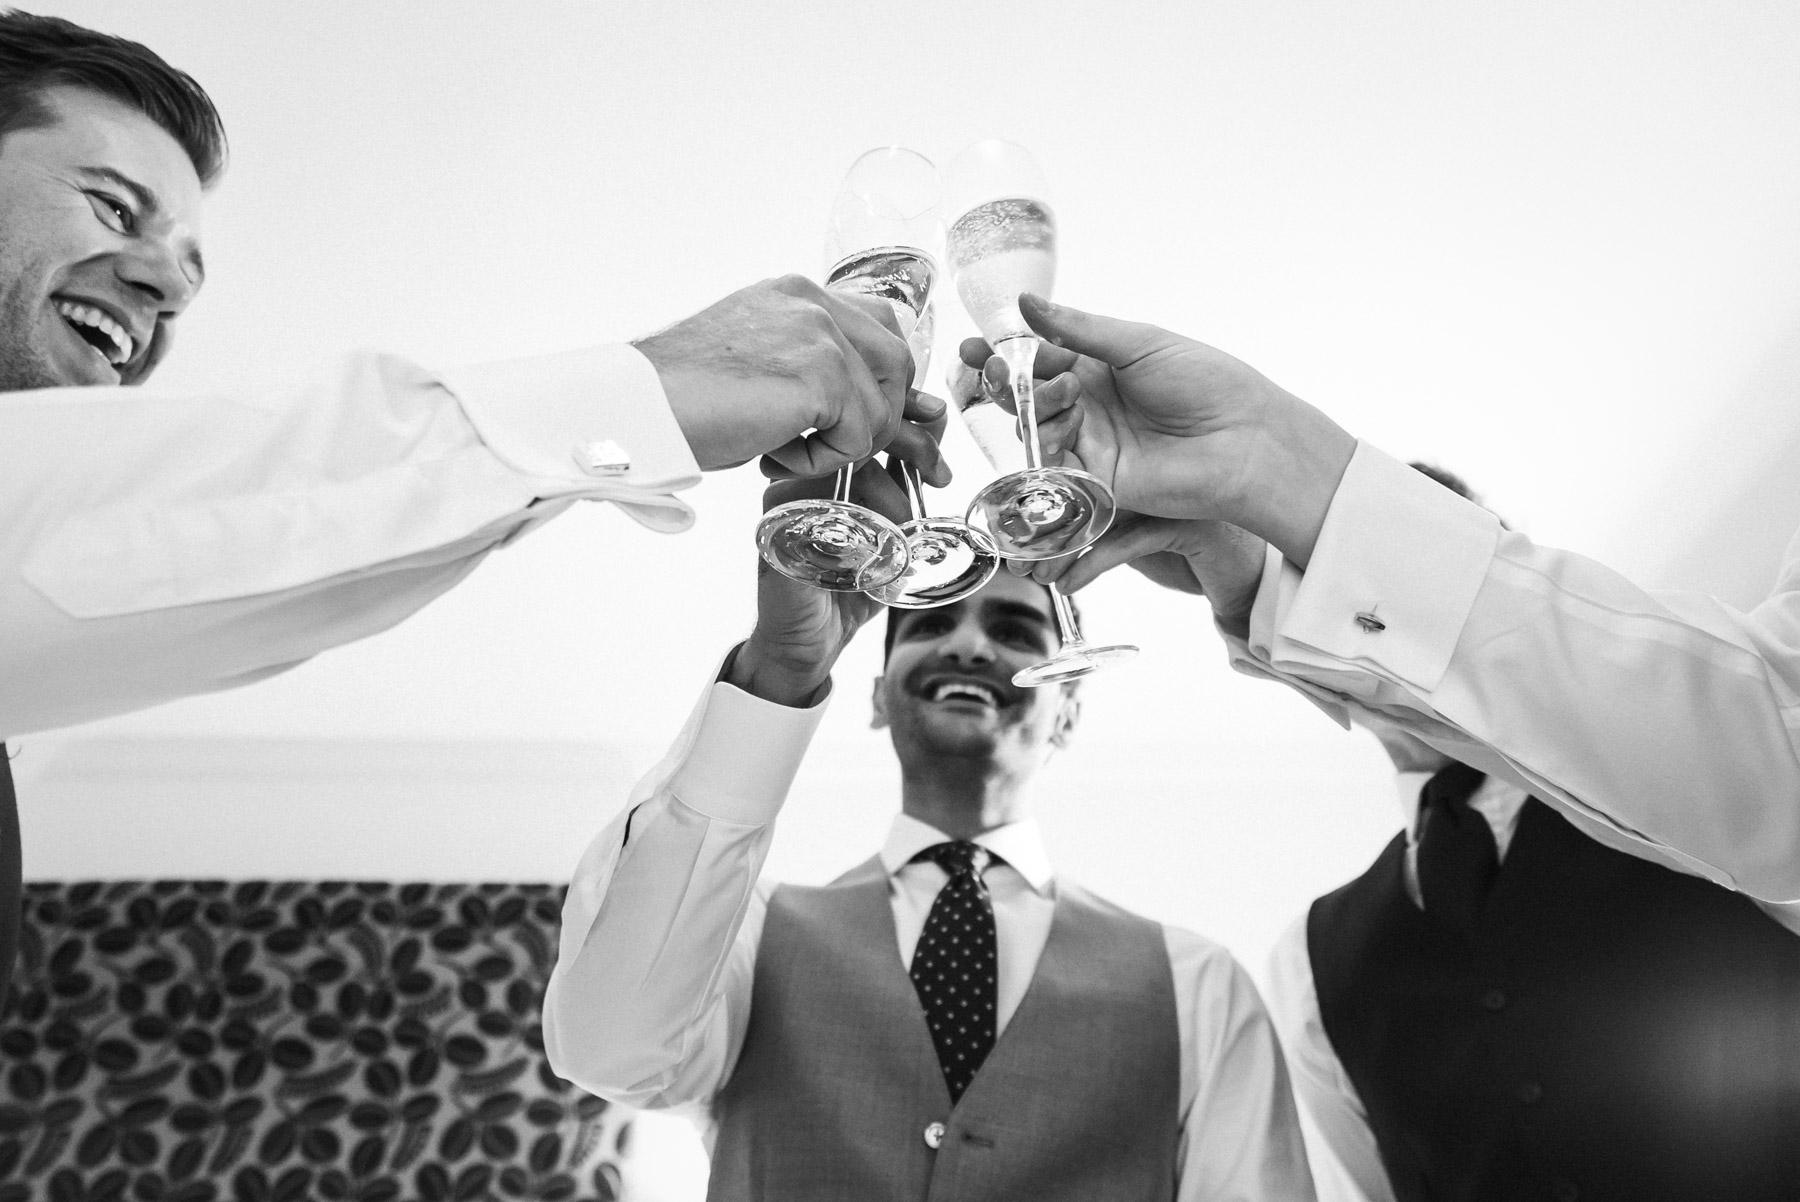 groomsmen cheer on the morning of the wedding